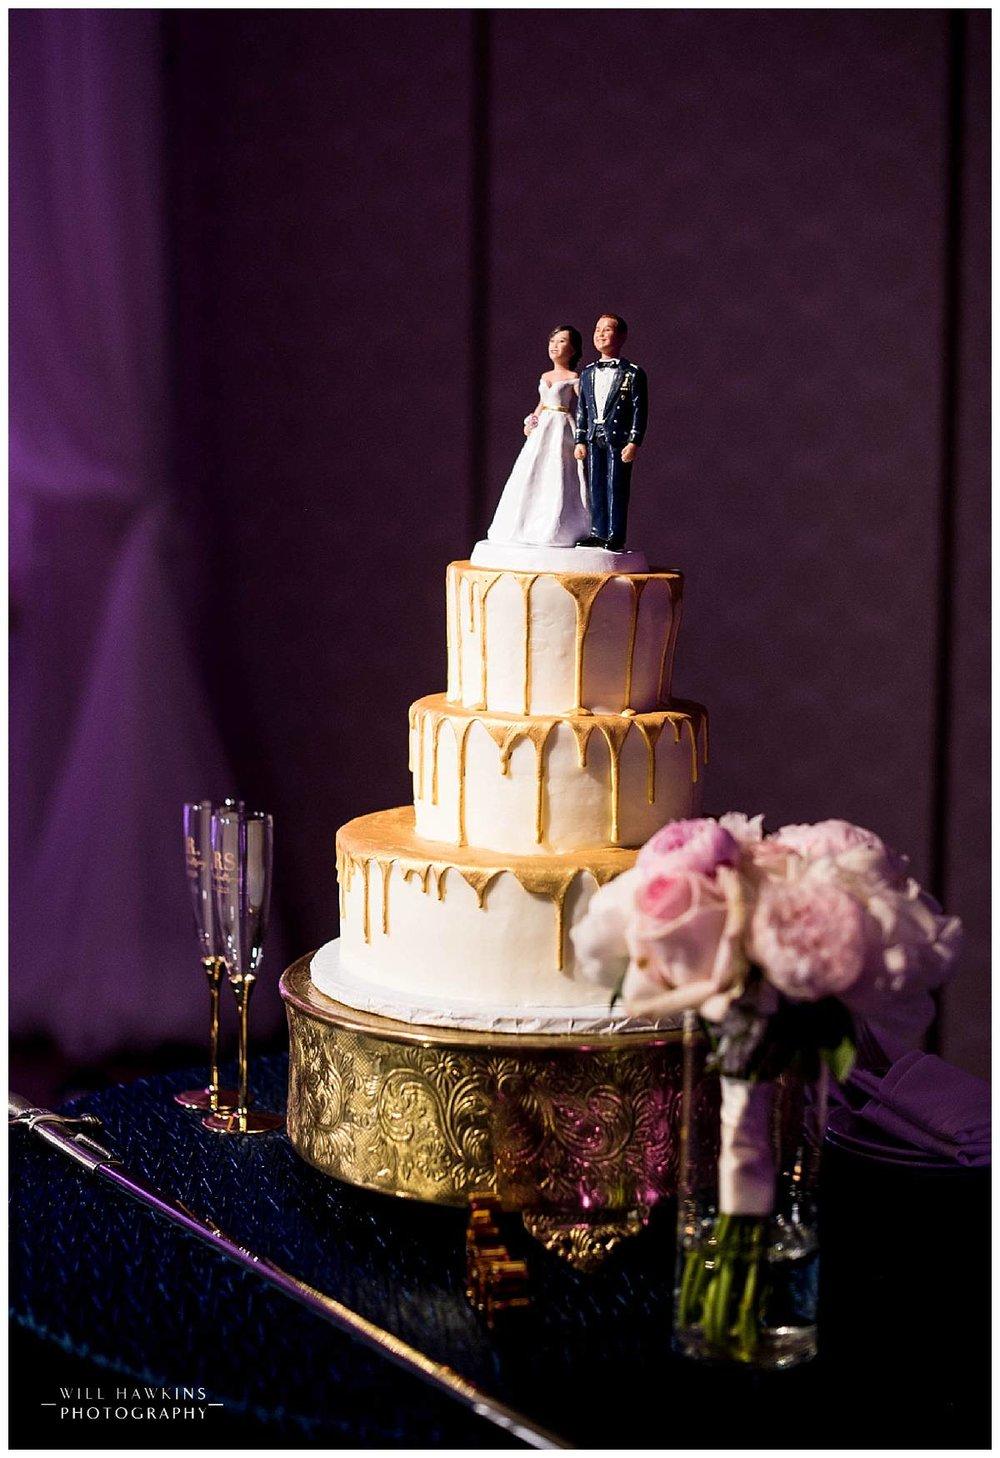 2018-11-25_0026.jpgWill Hawkins Photography Richmond Wedding Photographer Virginia Wedding Photographer